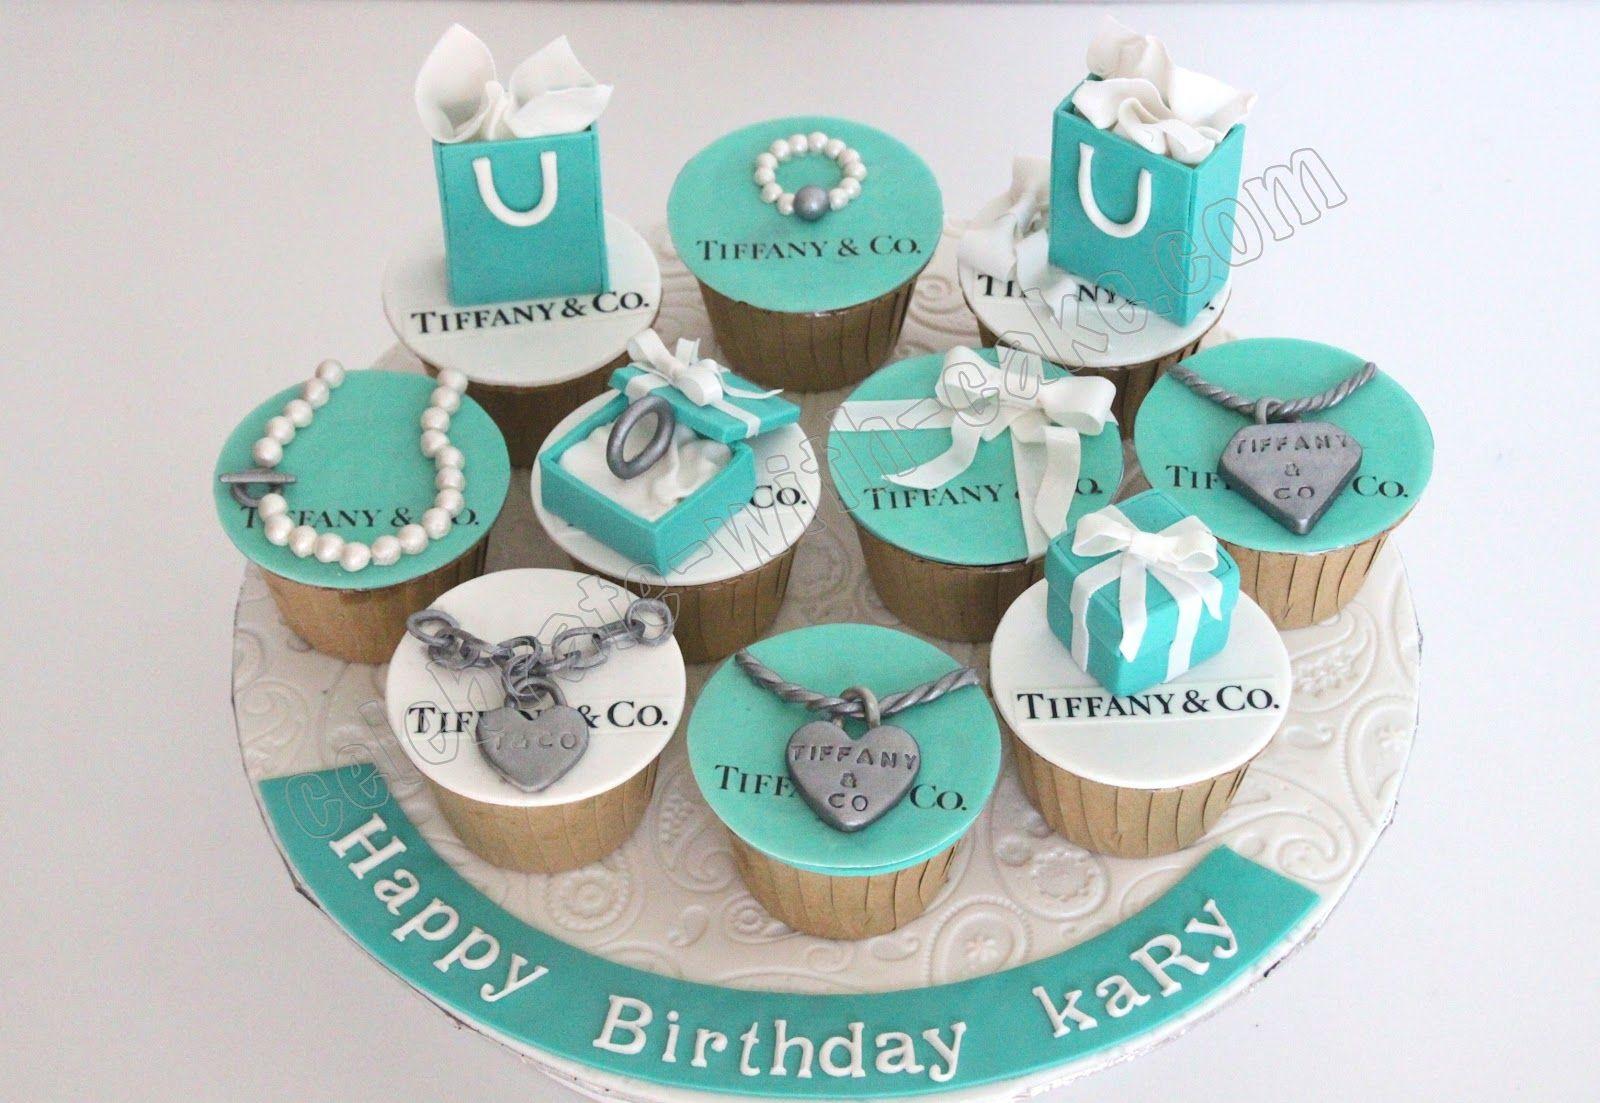 cb1b48b2a9a Tiffany cupcakes | Girl Birthday Cupcakes | Tiffany cupcakes ...